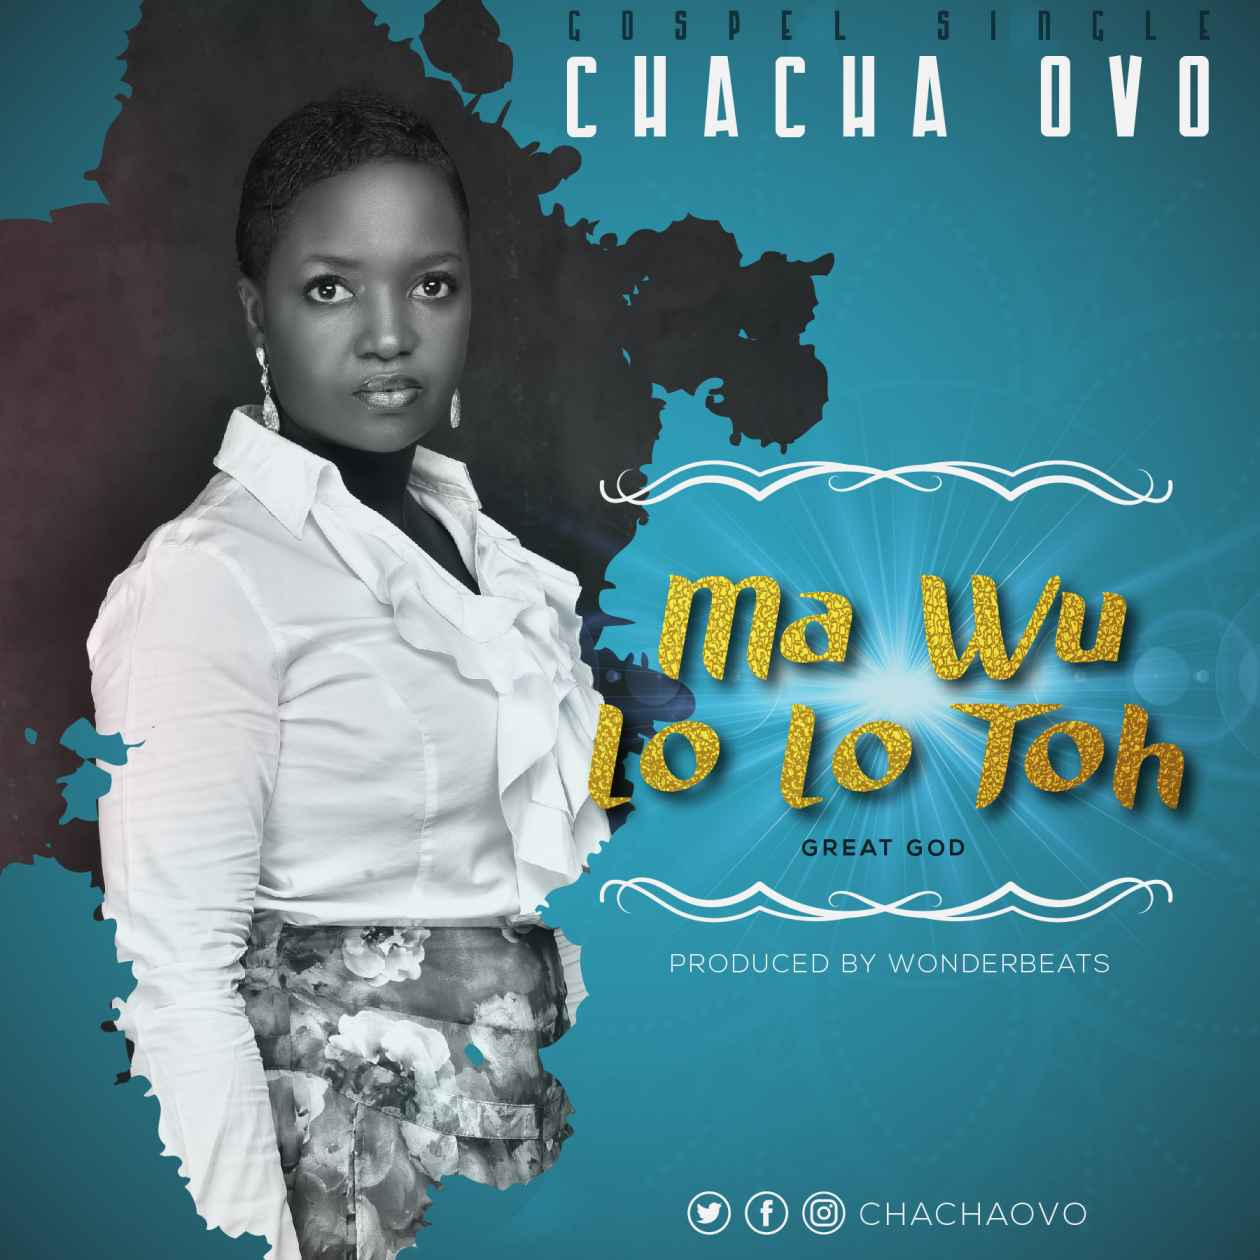 Chacha Ovo - Ma Wu Lolo Toh